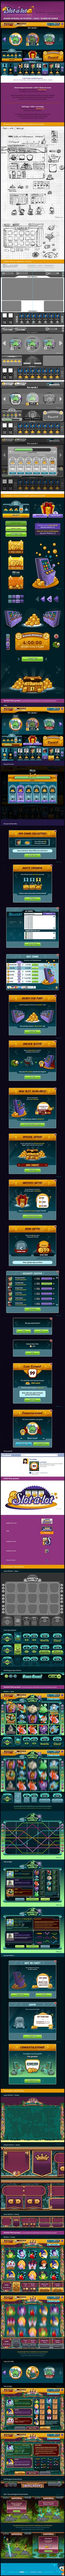 Slots-Social-Game---GUI-Design-on-Behance